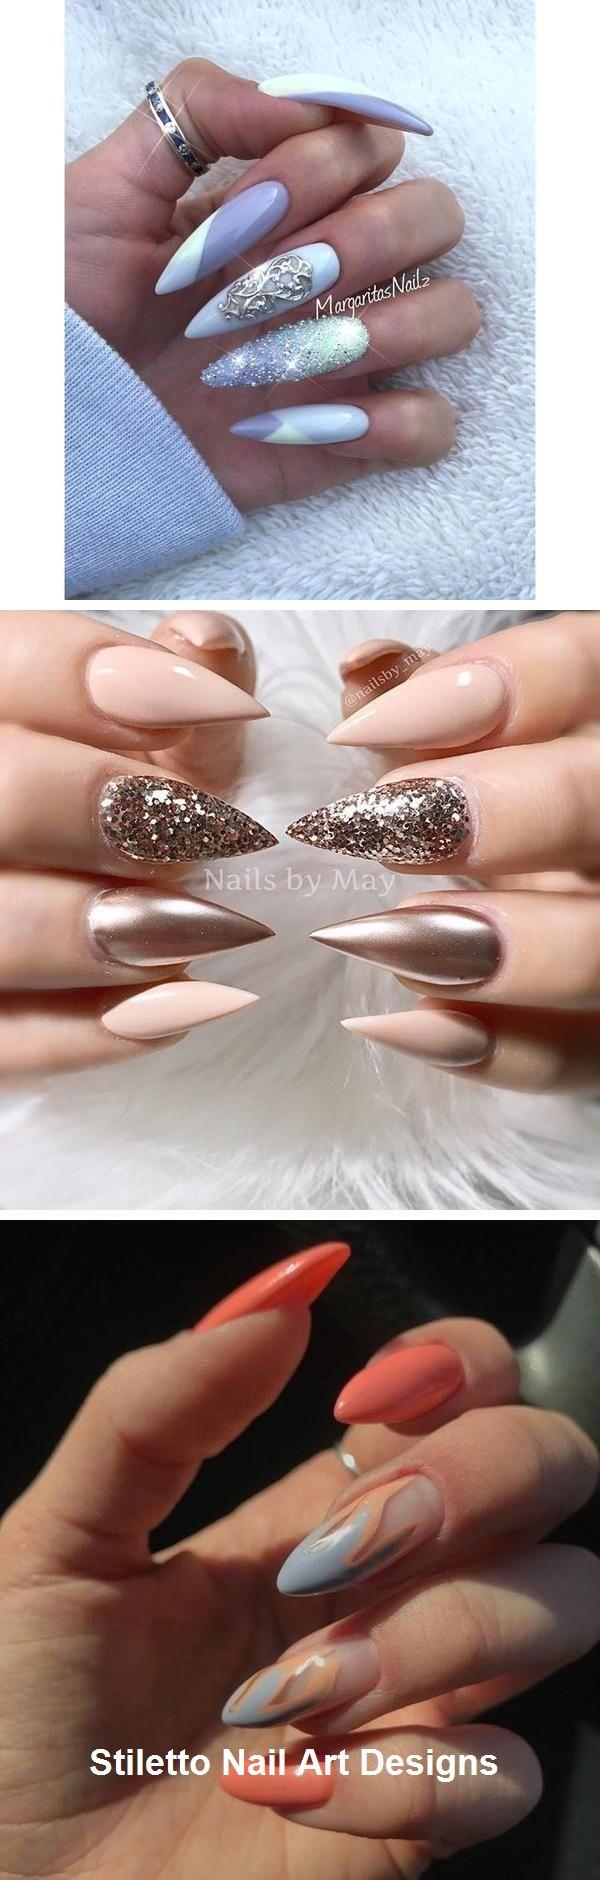 30 große Stiletto Nail Art Design-Ideen # Stilettonails – Nageldesign